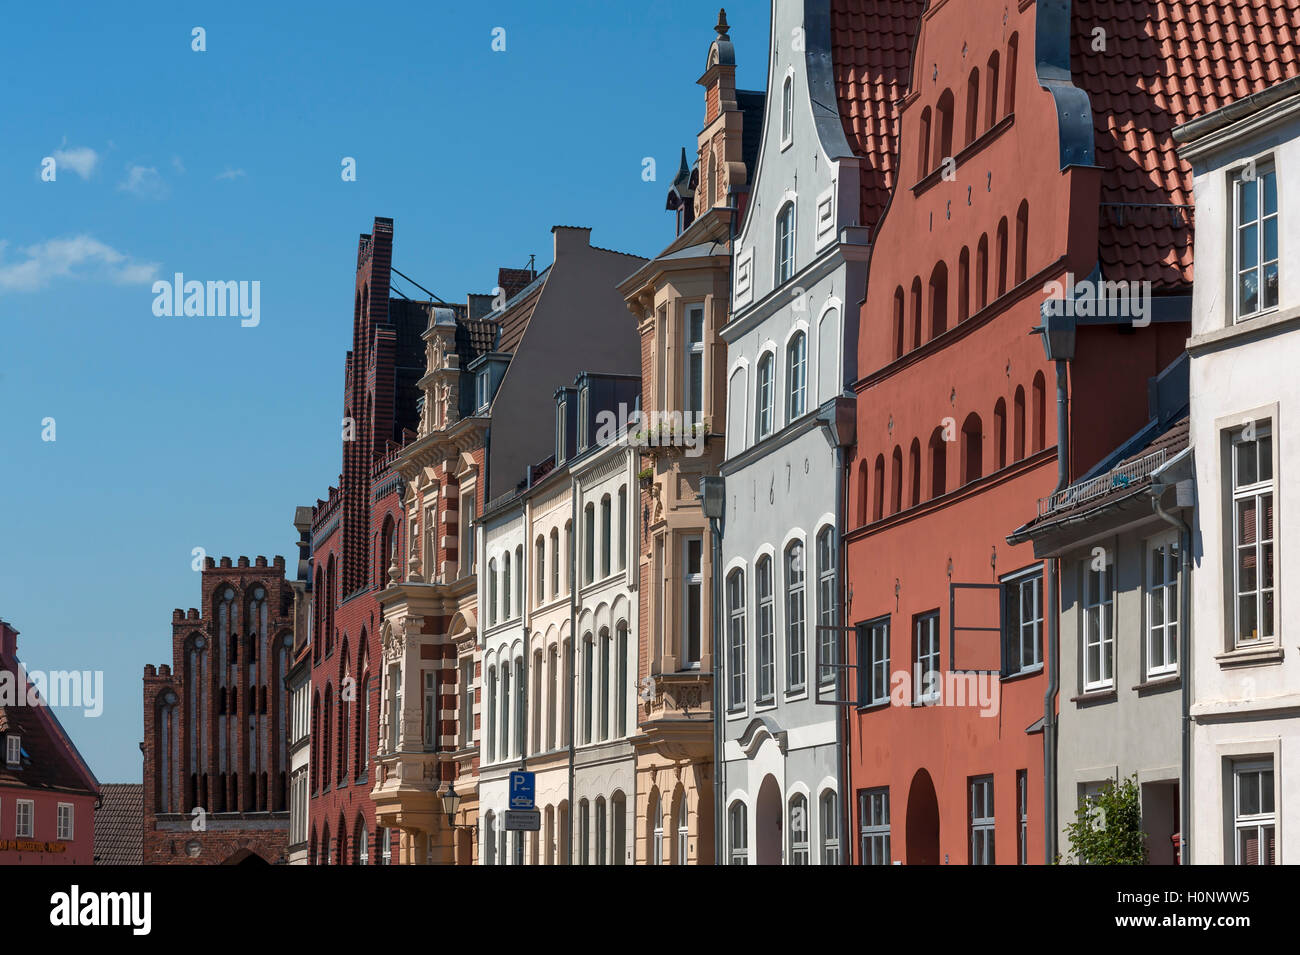 Facades from different eras, Wismar, Mecklenburg-Western Pomerania, Germany - Stock Image